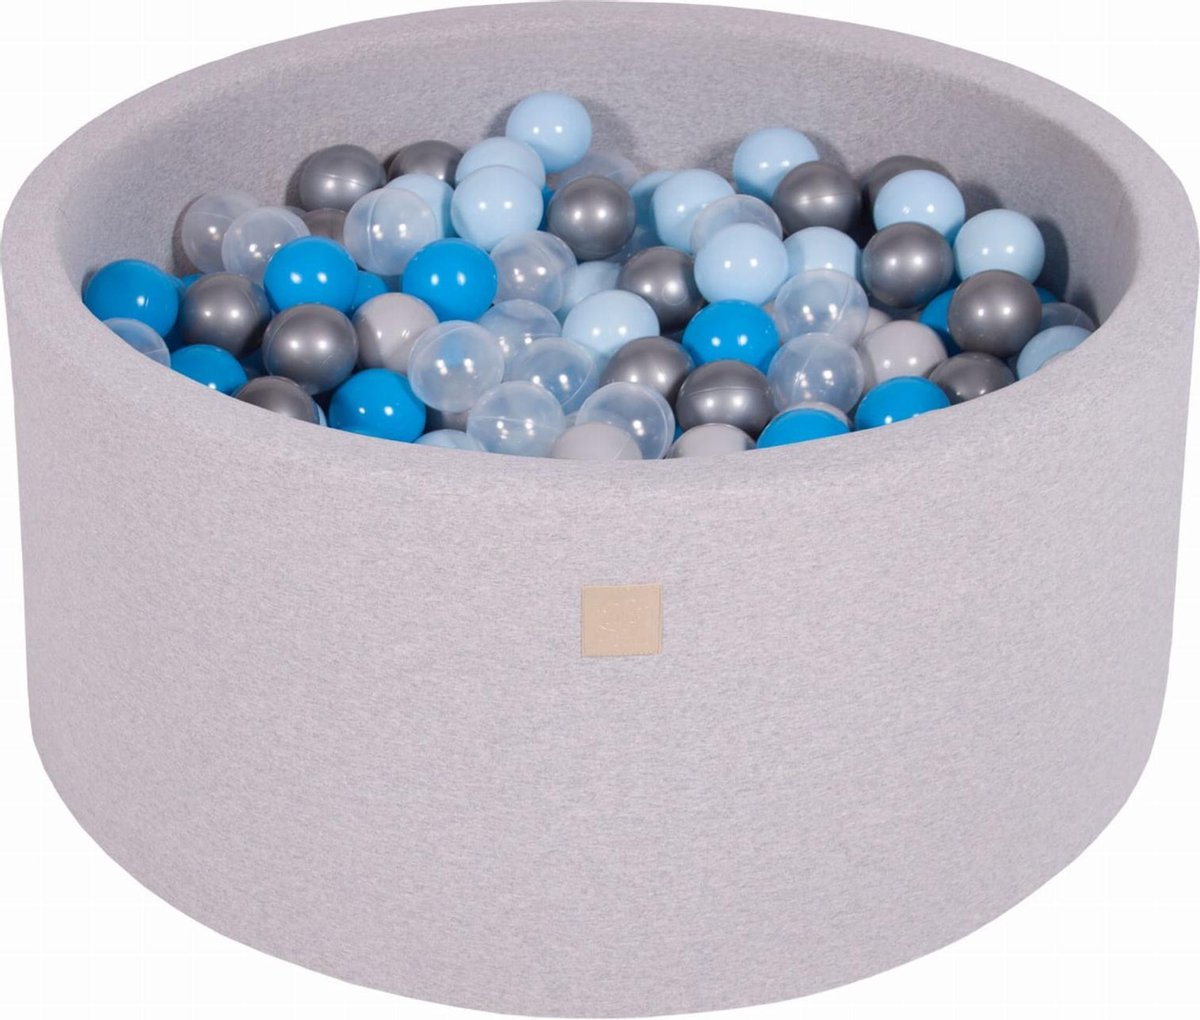 Ronde Ballenbak set incl 300 ballen 90x40cm - Licht Grijs: Blauw, Transparant, Babyblauw, Zilver